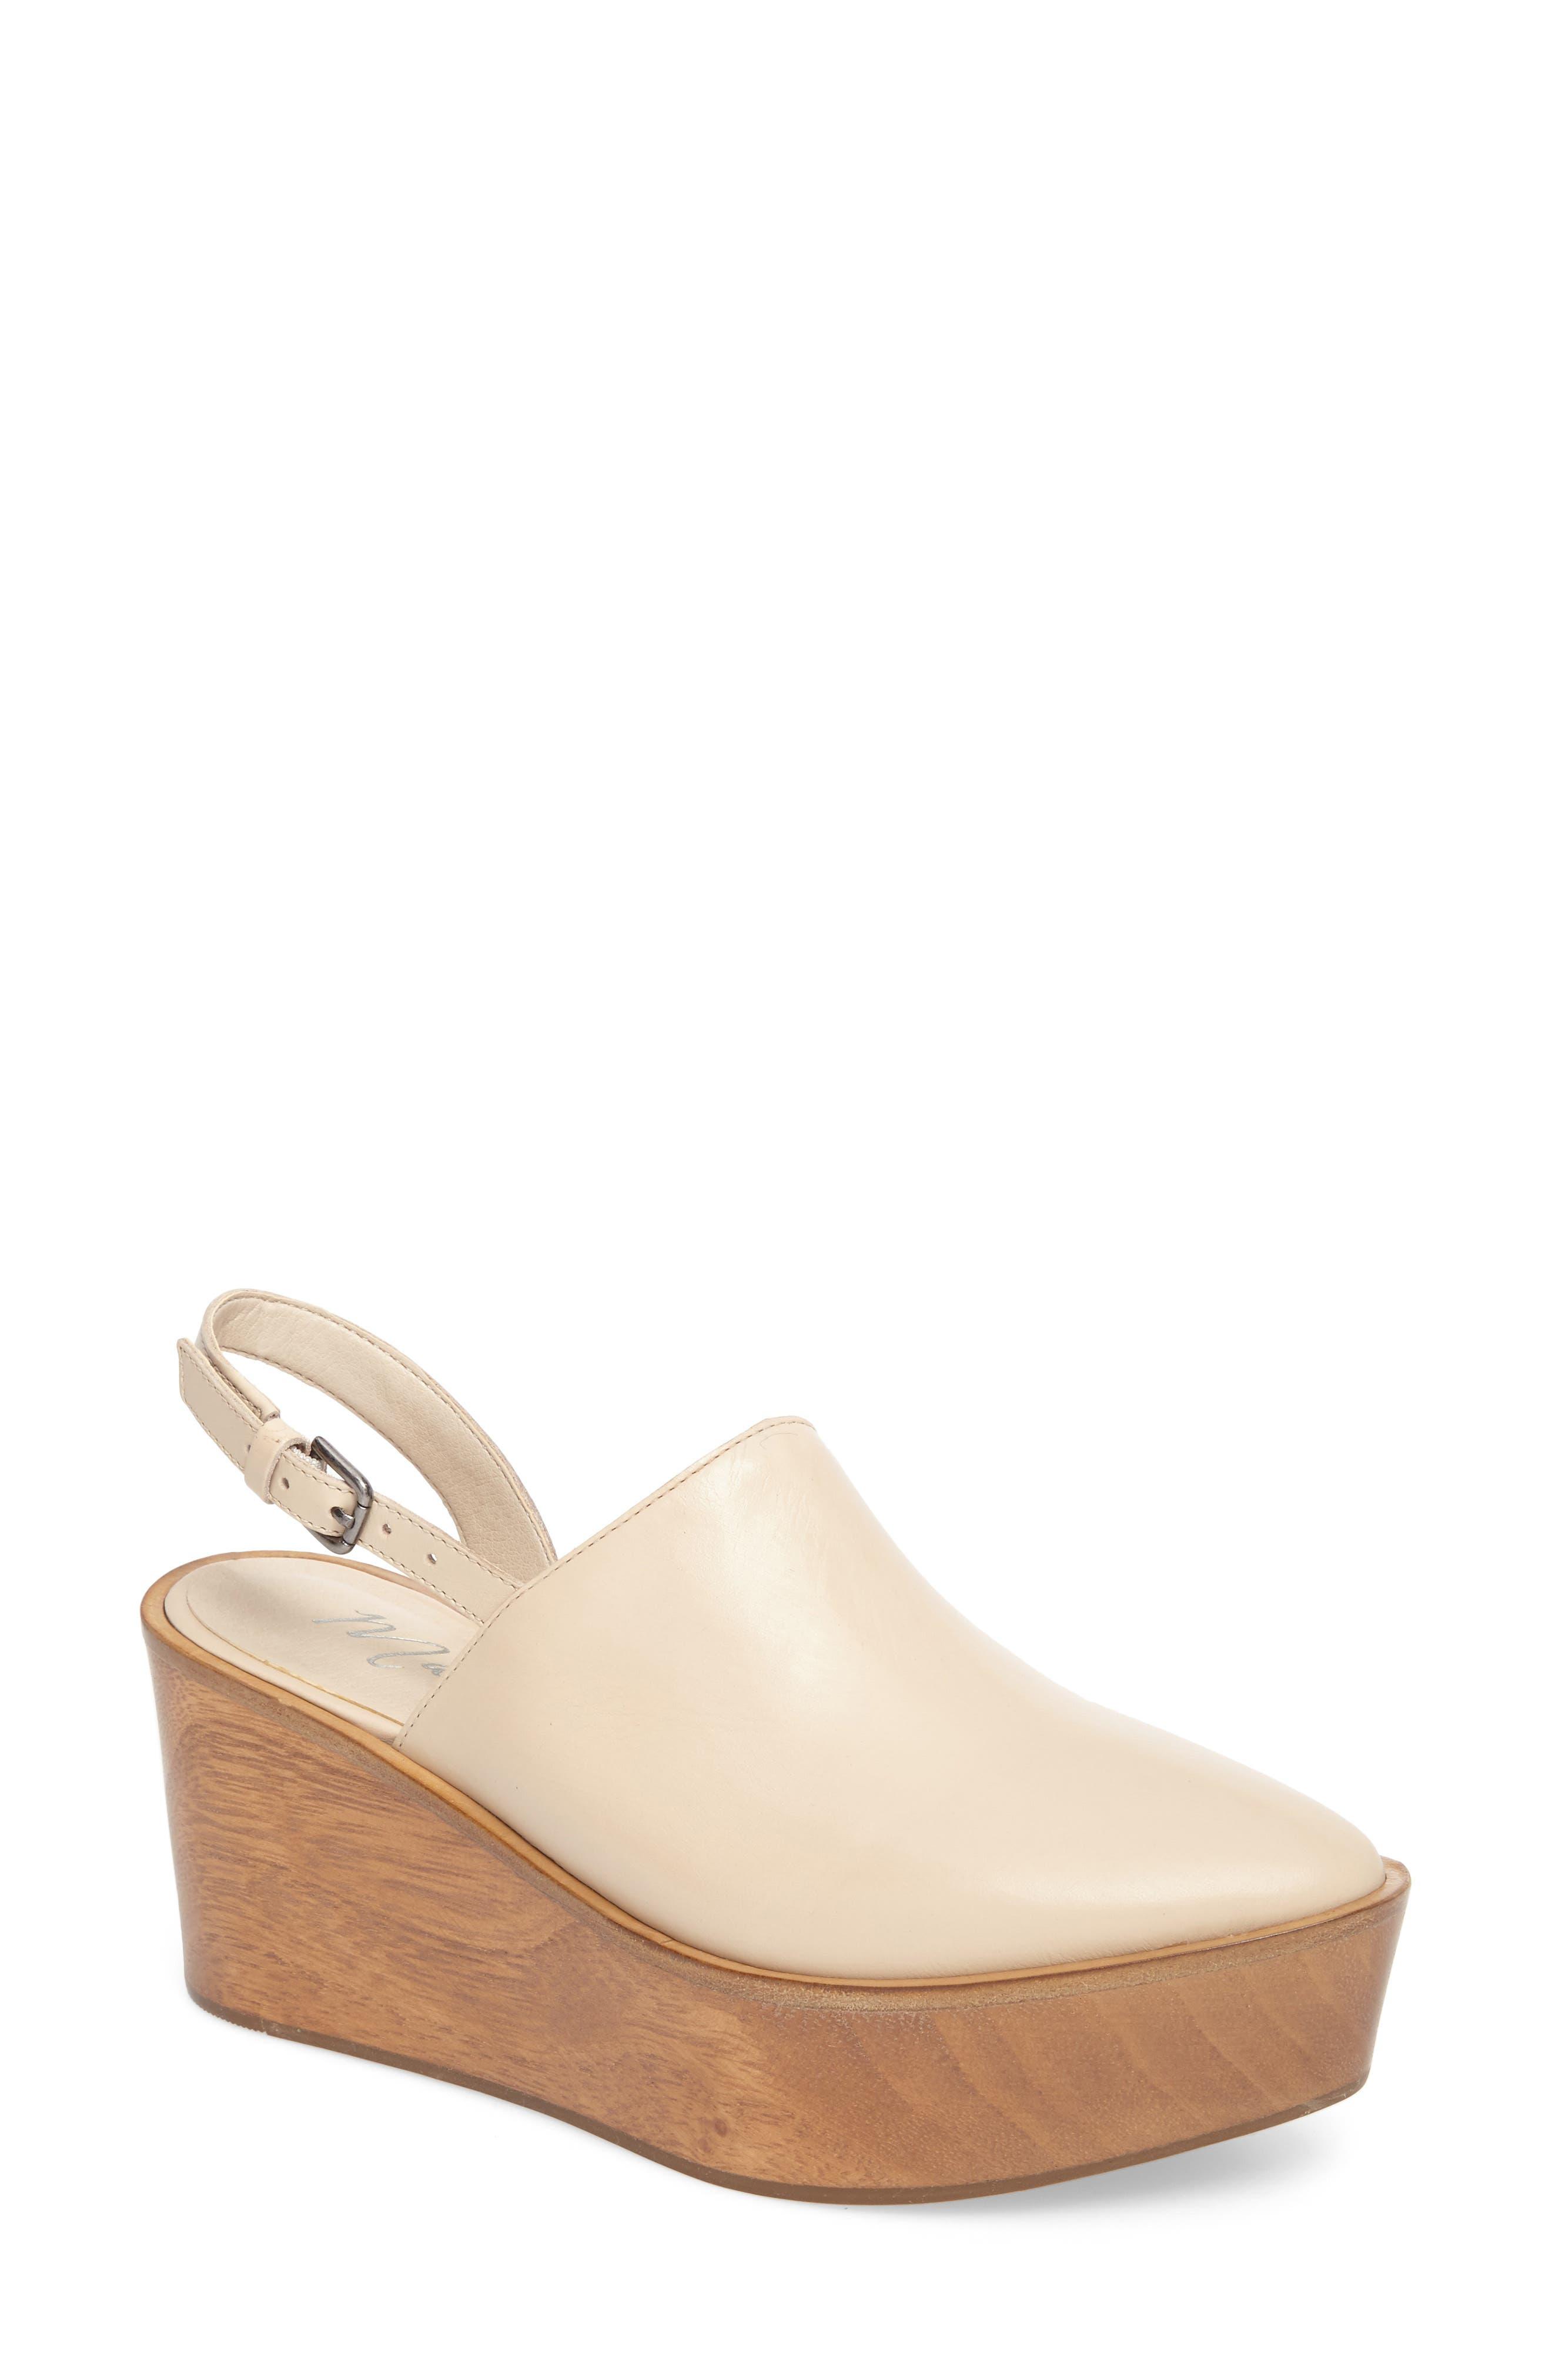 Eyals Slingback Platform Wedge Sandal,                             Main thumbnail 1, color,                             Natural Leather